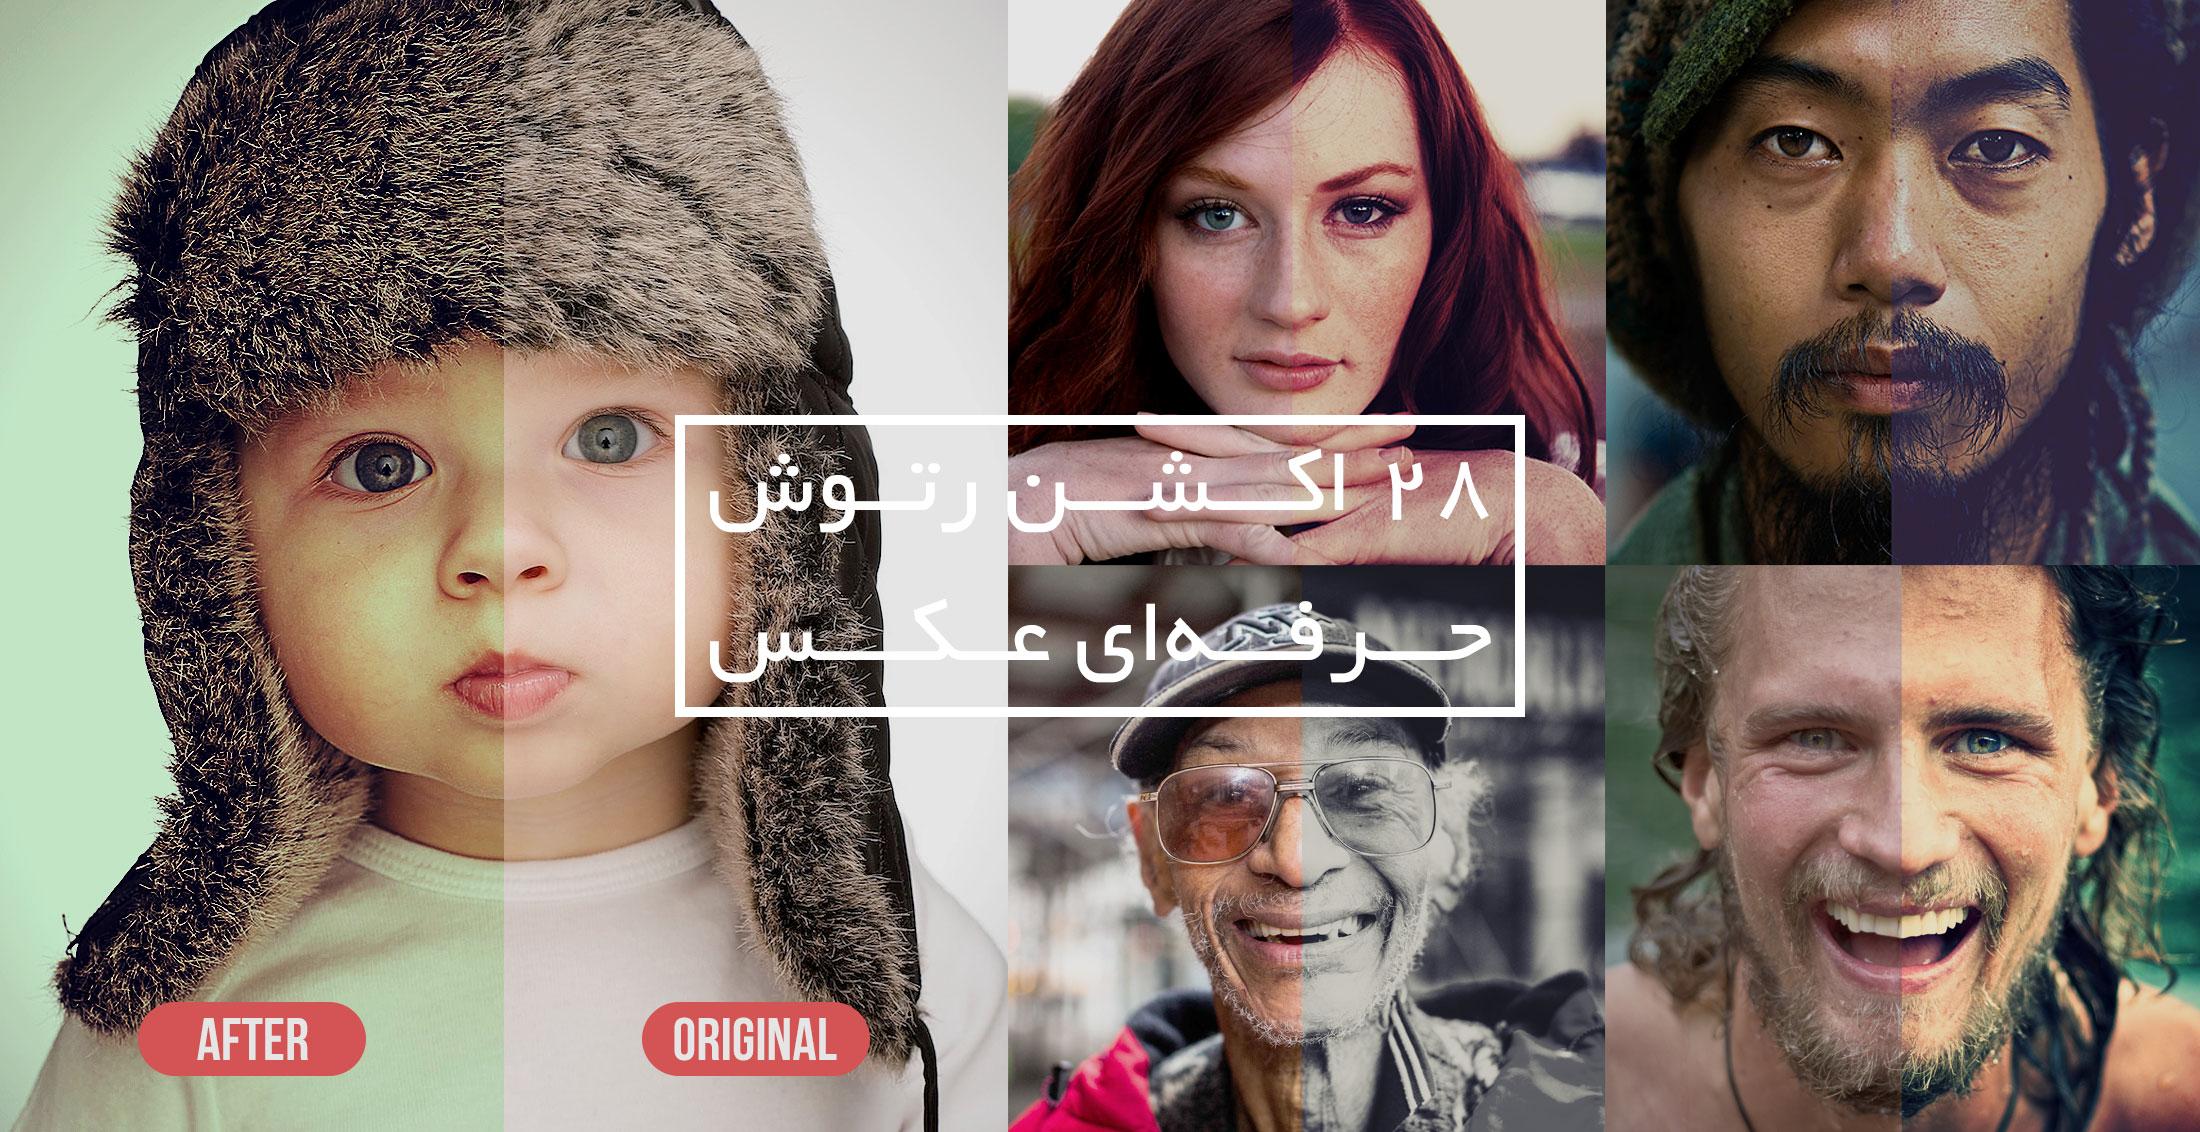 آپلود عکس مجید آنلاین